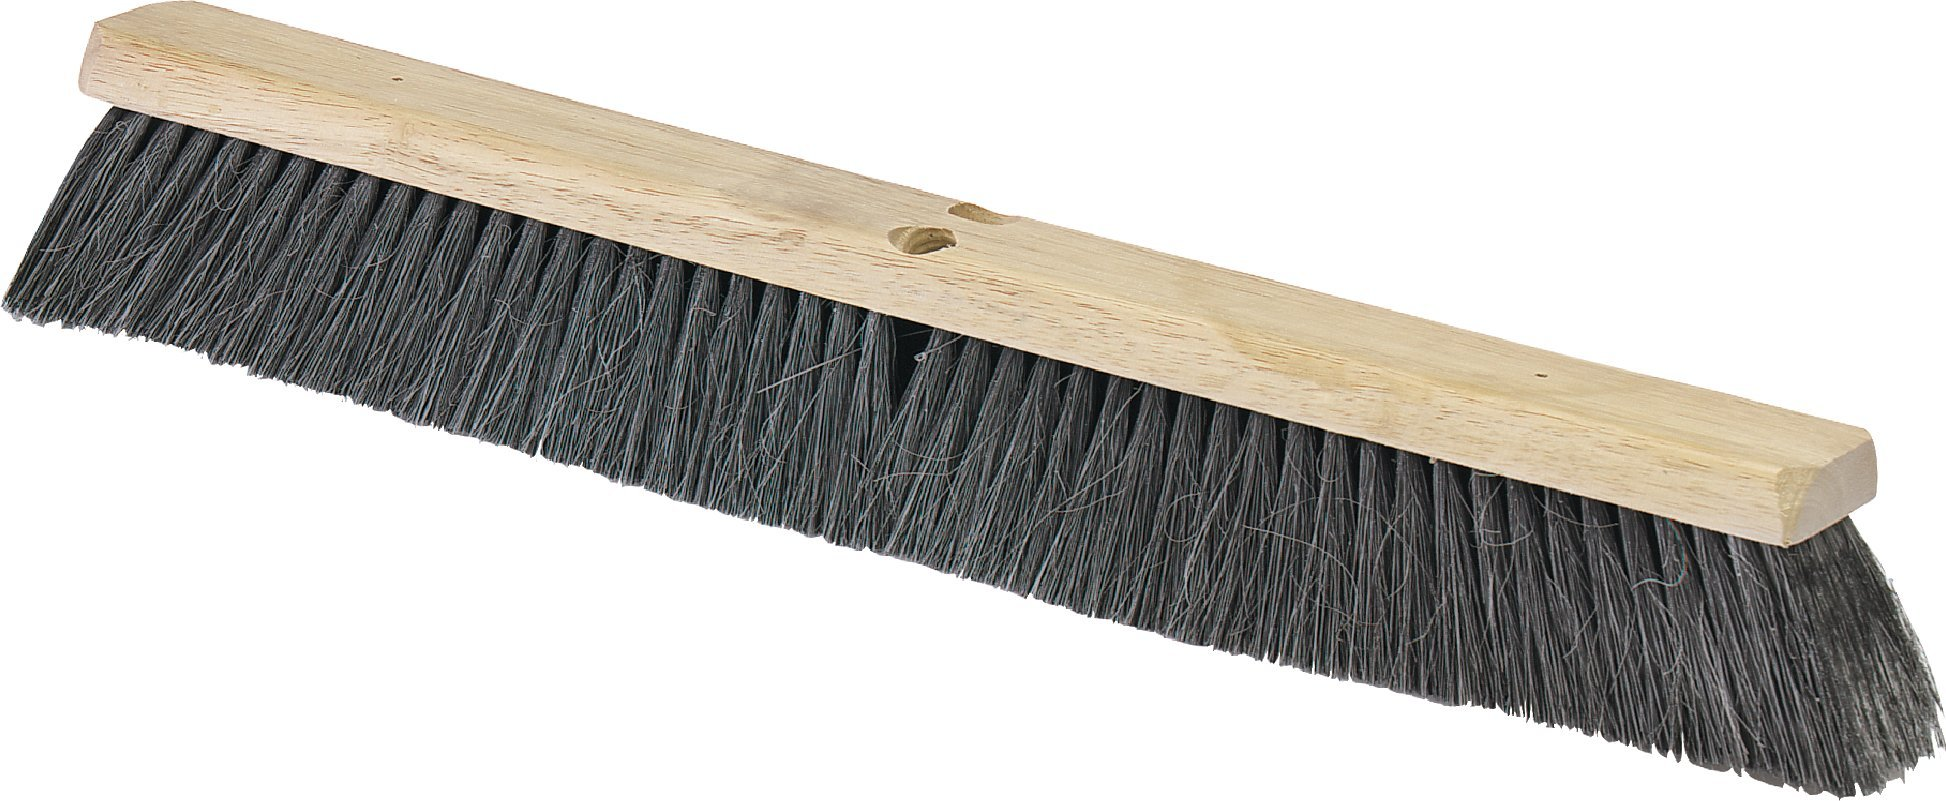 Carlisle 36202403 Flo-Pac Hardwood Block Medium Floor Sweep, Horsehair/Polypropylene Bristles, 24'' Block Size, 3'' Bristle Trim, Black